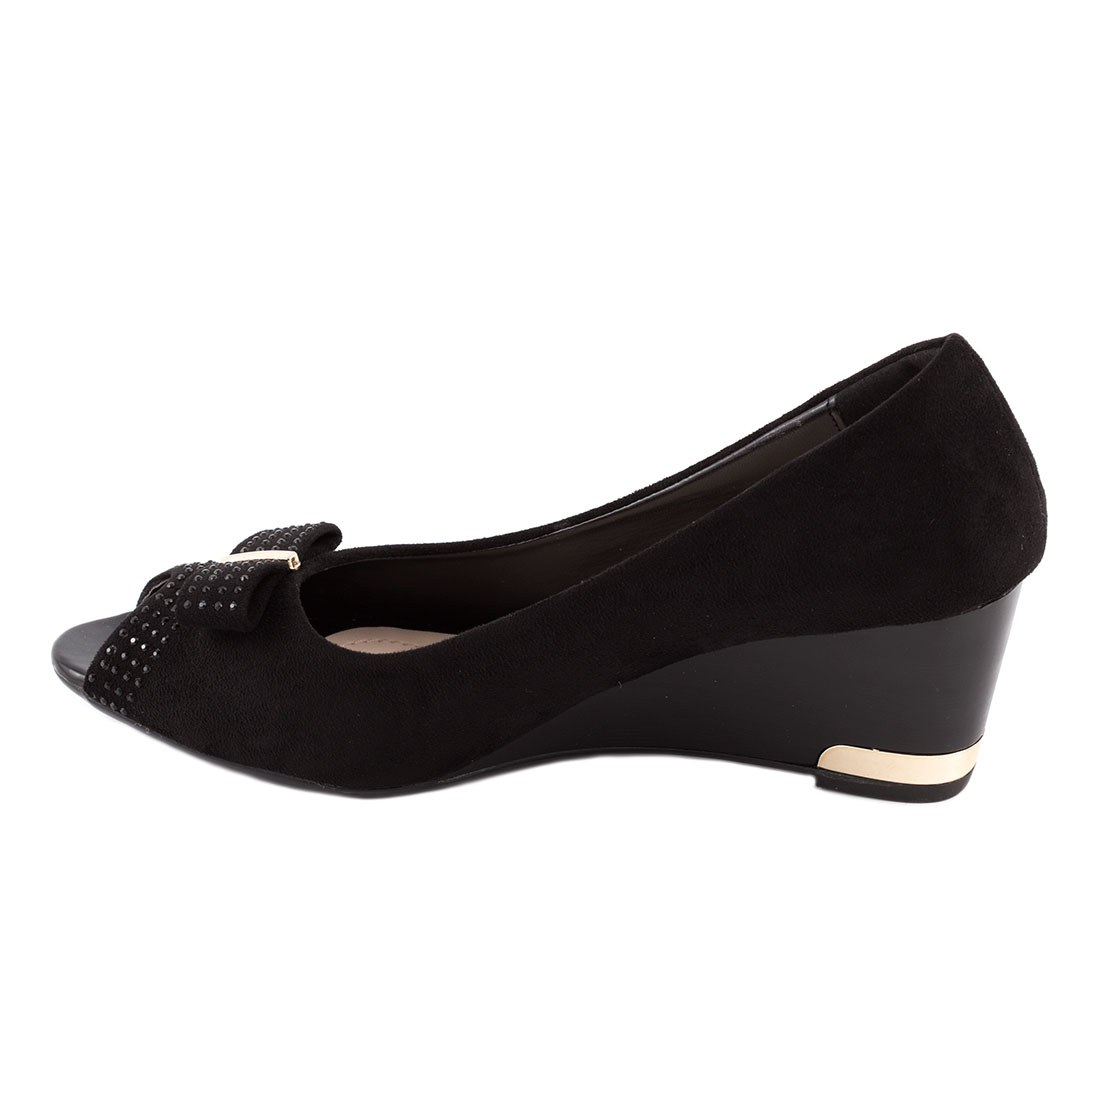 Pantofi dama cu fundita B1-26-NEGRU